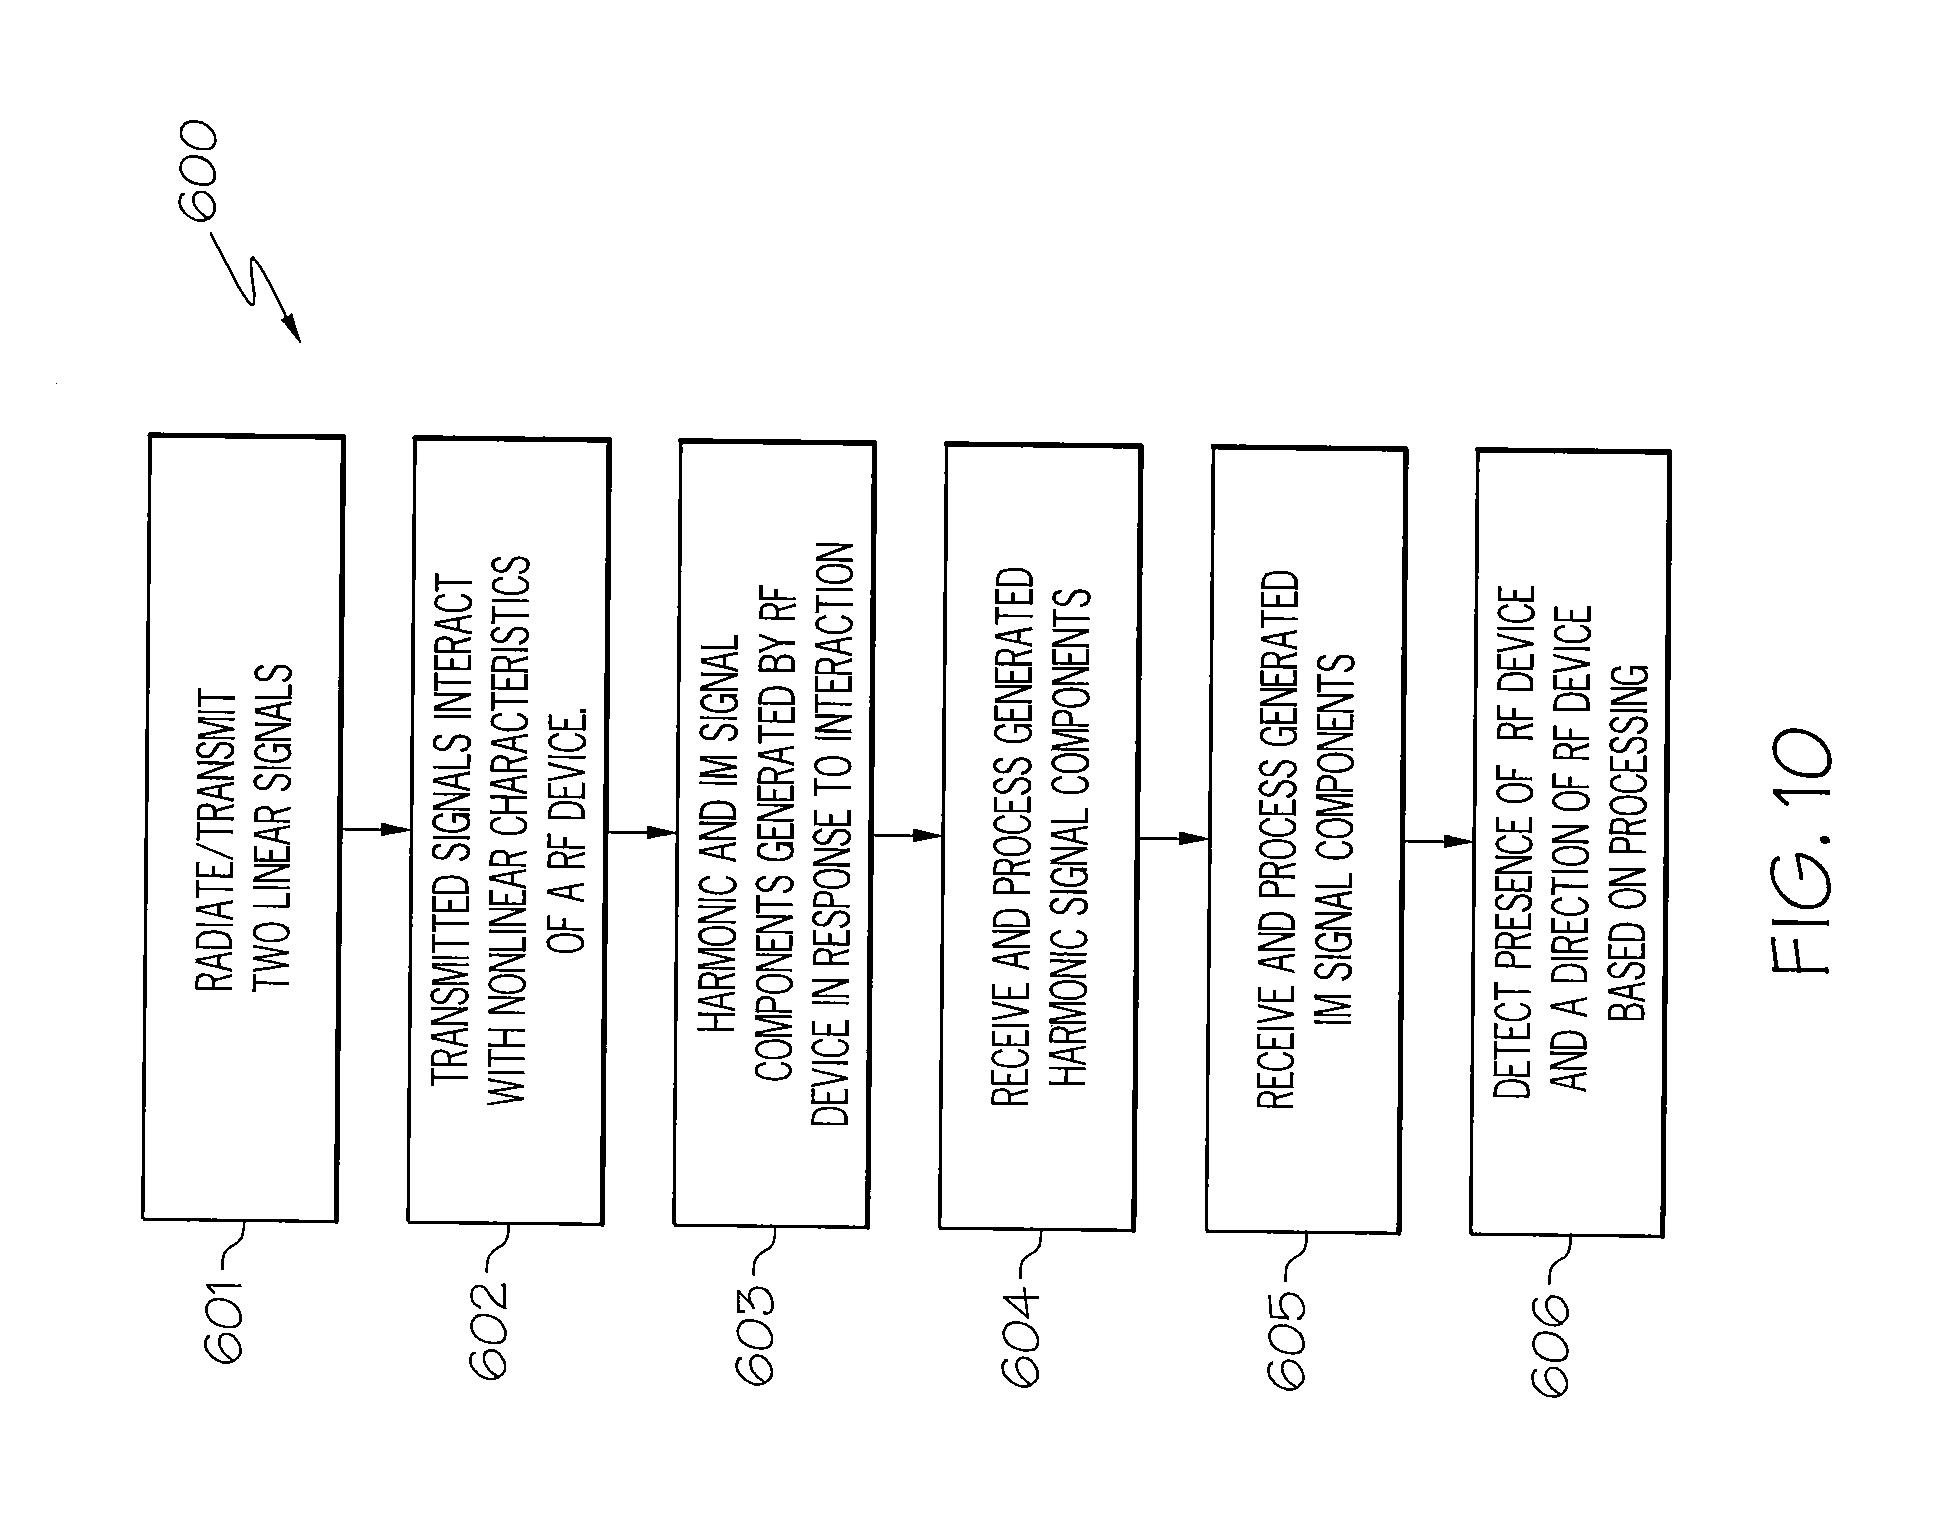 Patent Us20120256783 Radar Detection And Location Of Radio Transponder Circuit Diagram Tradeoficcom Drawing